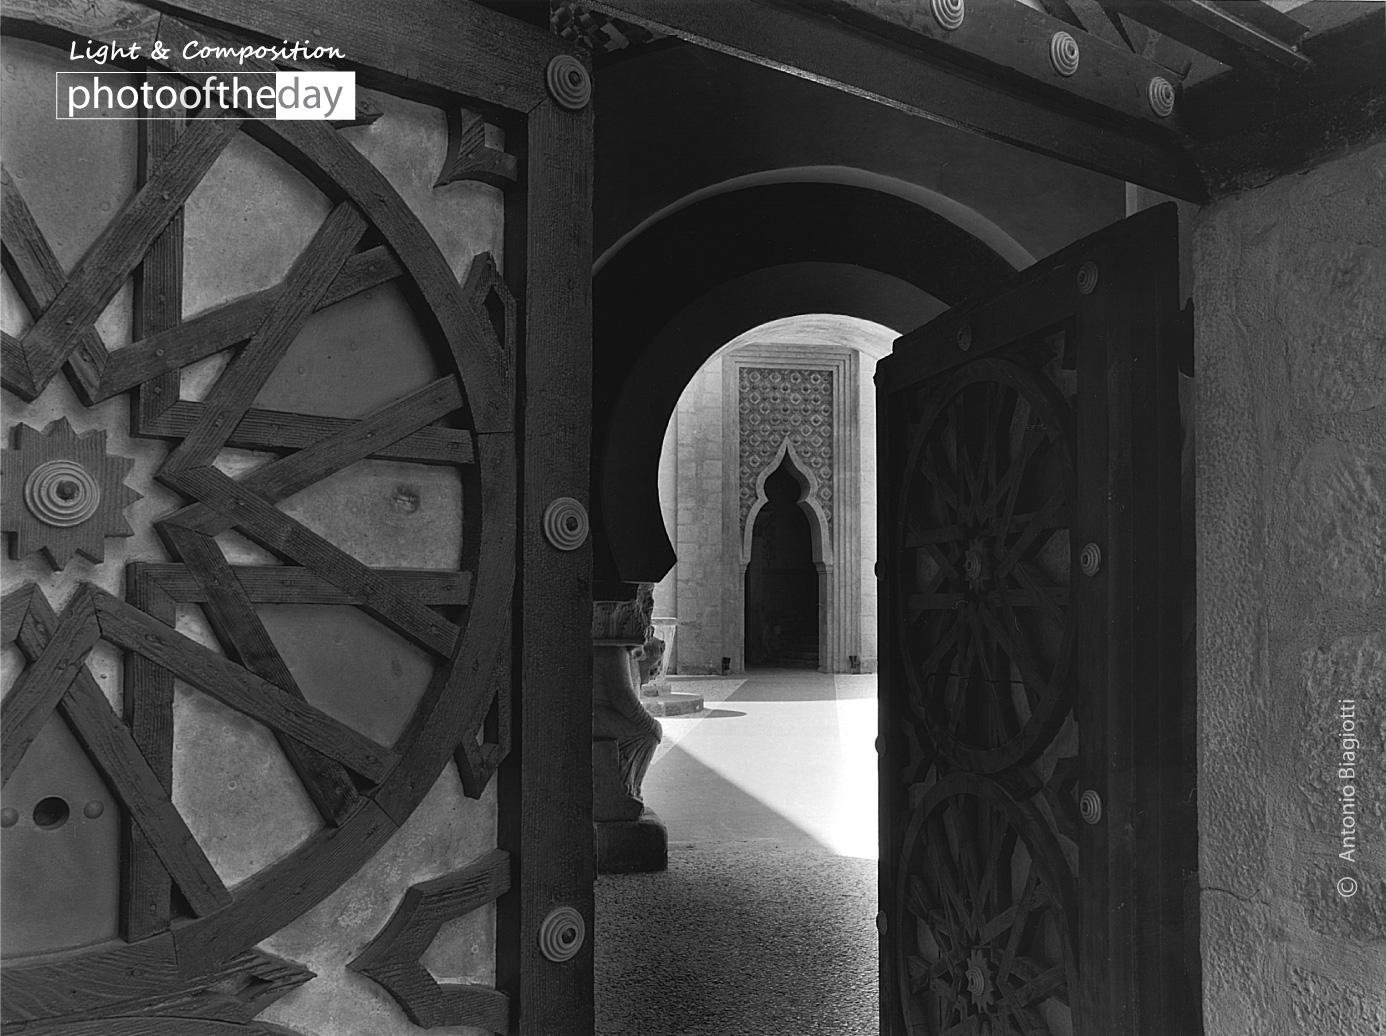 Entrance Door of Rocchetta Mattei by Antonio Biagiotti